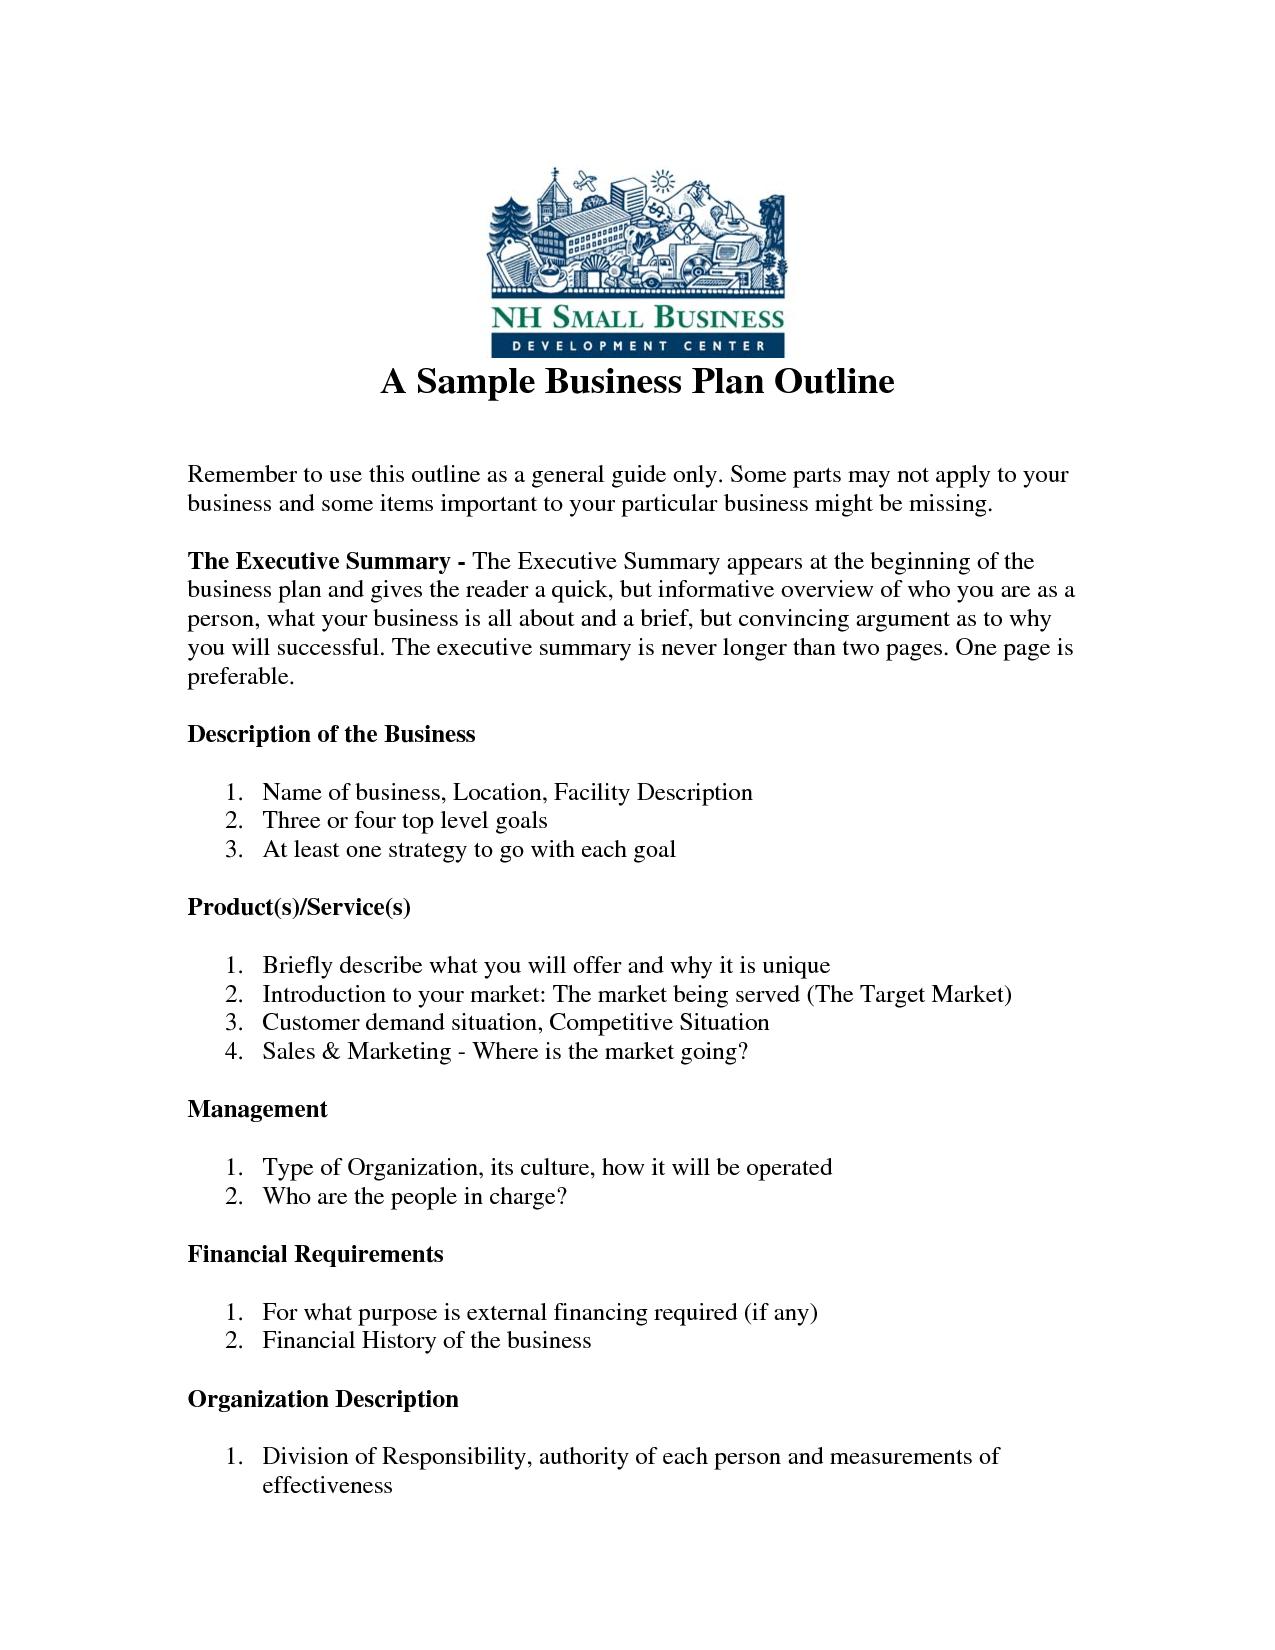 Printable Sample Business Plan Sample Form | Forms And Template - Free Printable Simple Business Plan Template